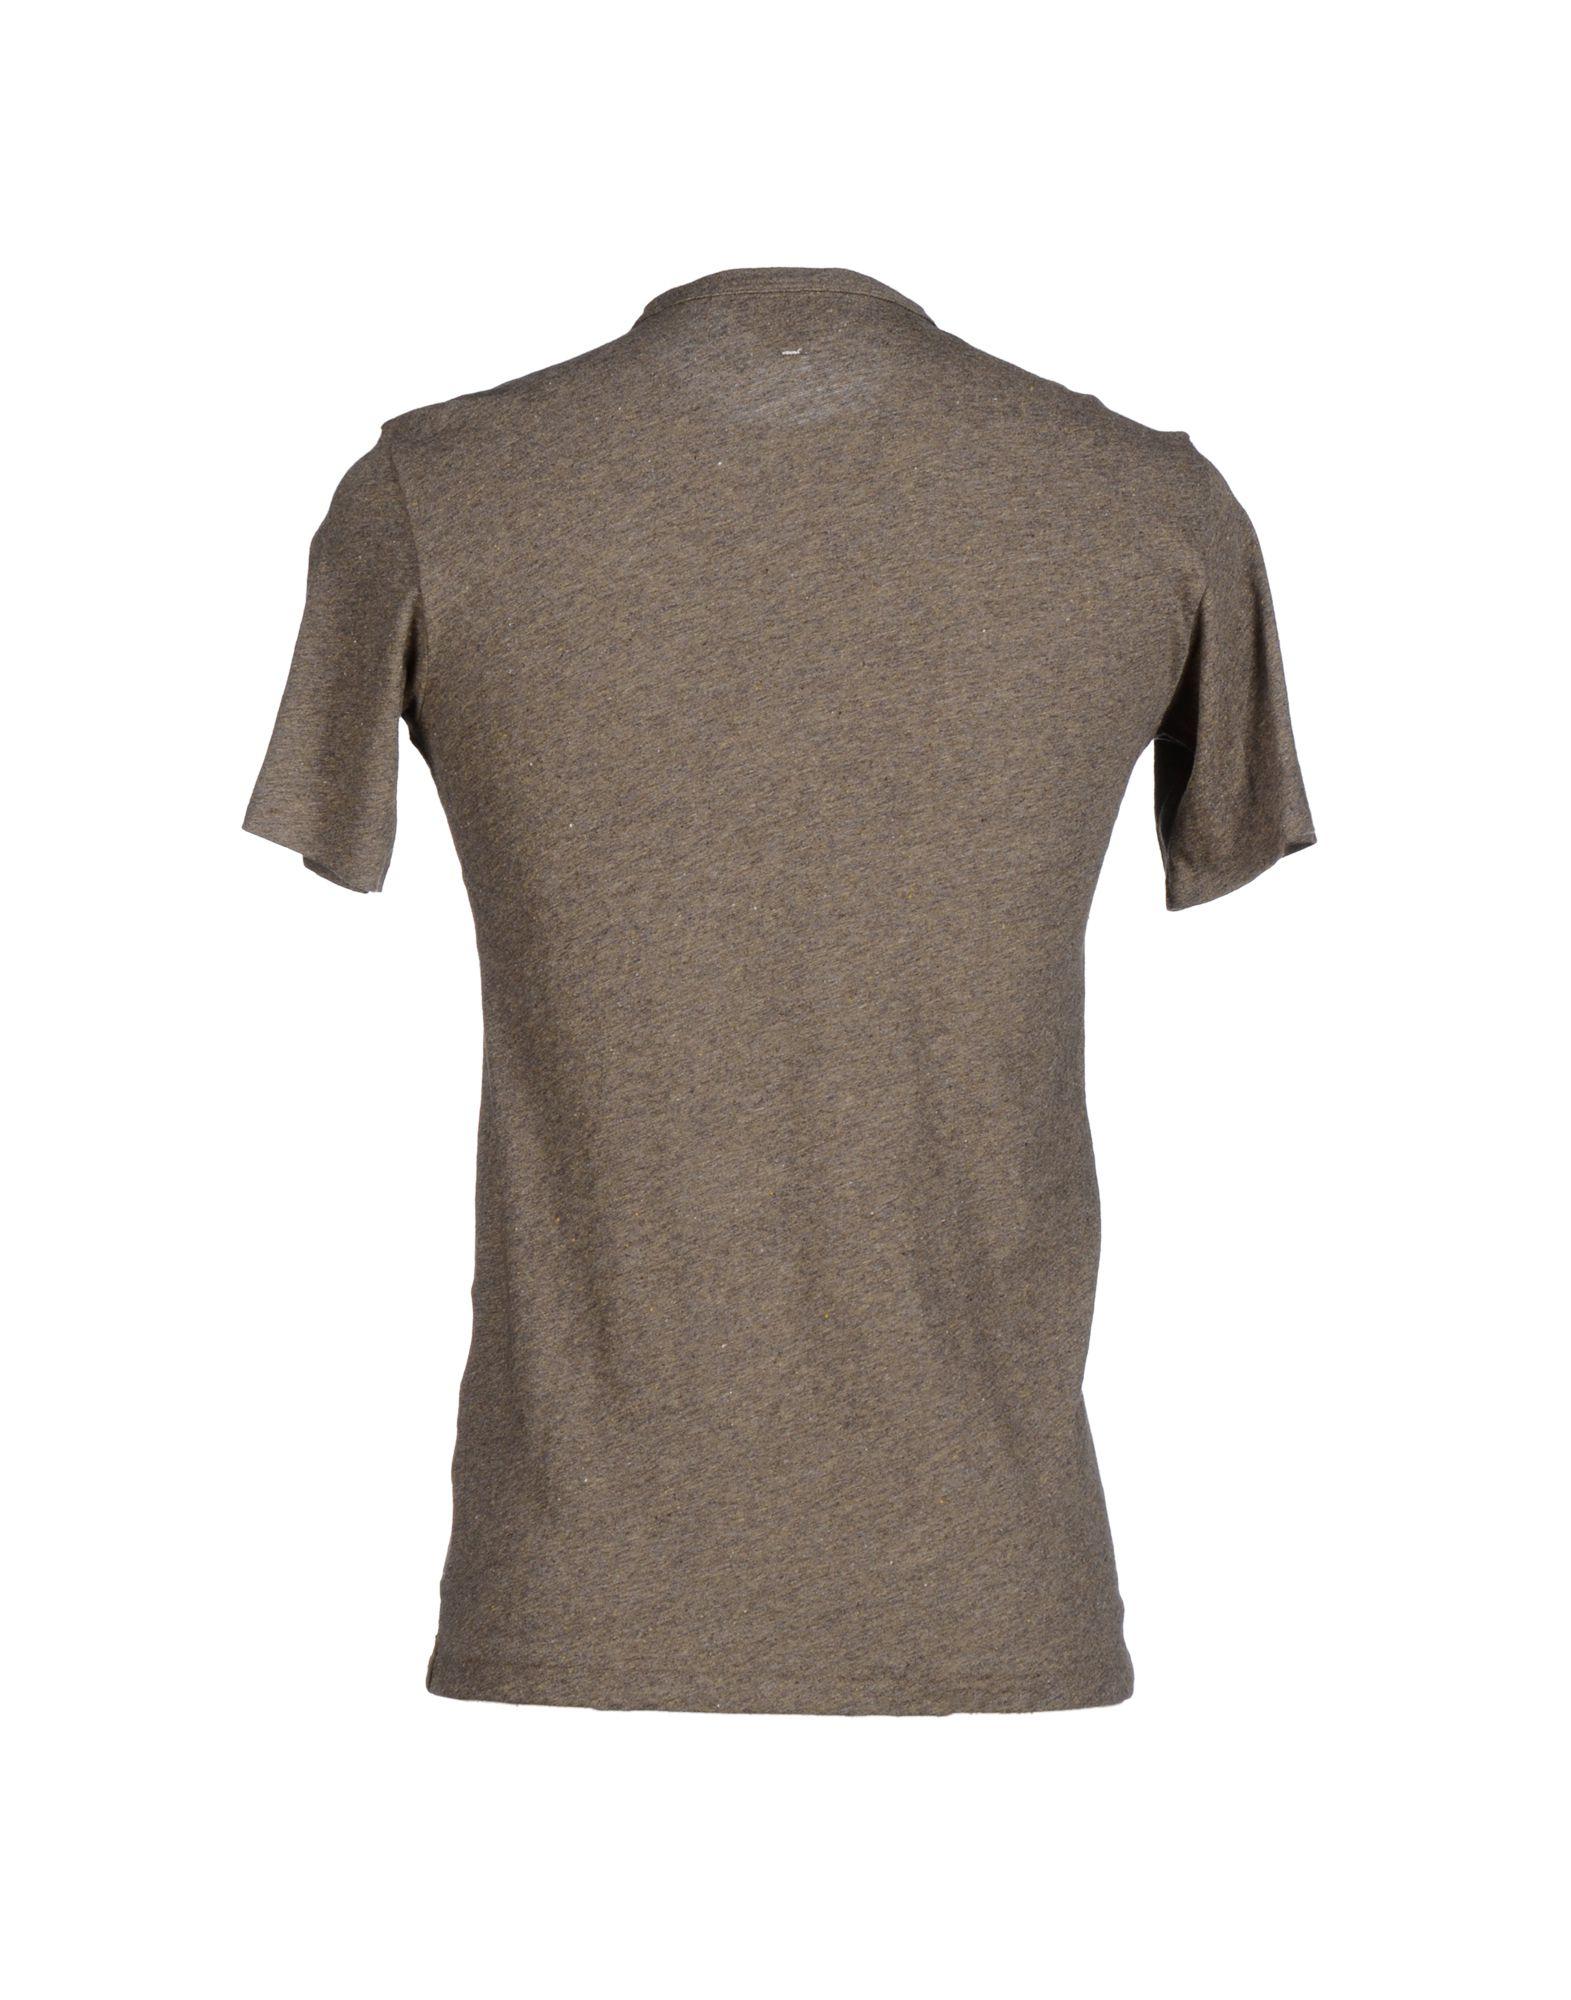 Rag Bone T Shirt In Natural For Men Khaki Save 6 Lyst